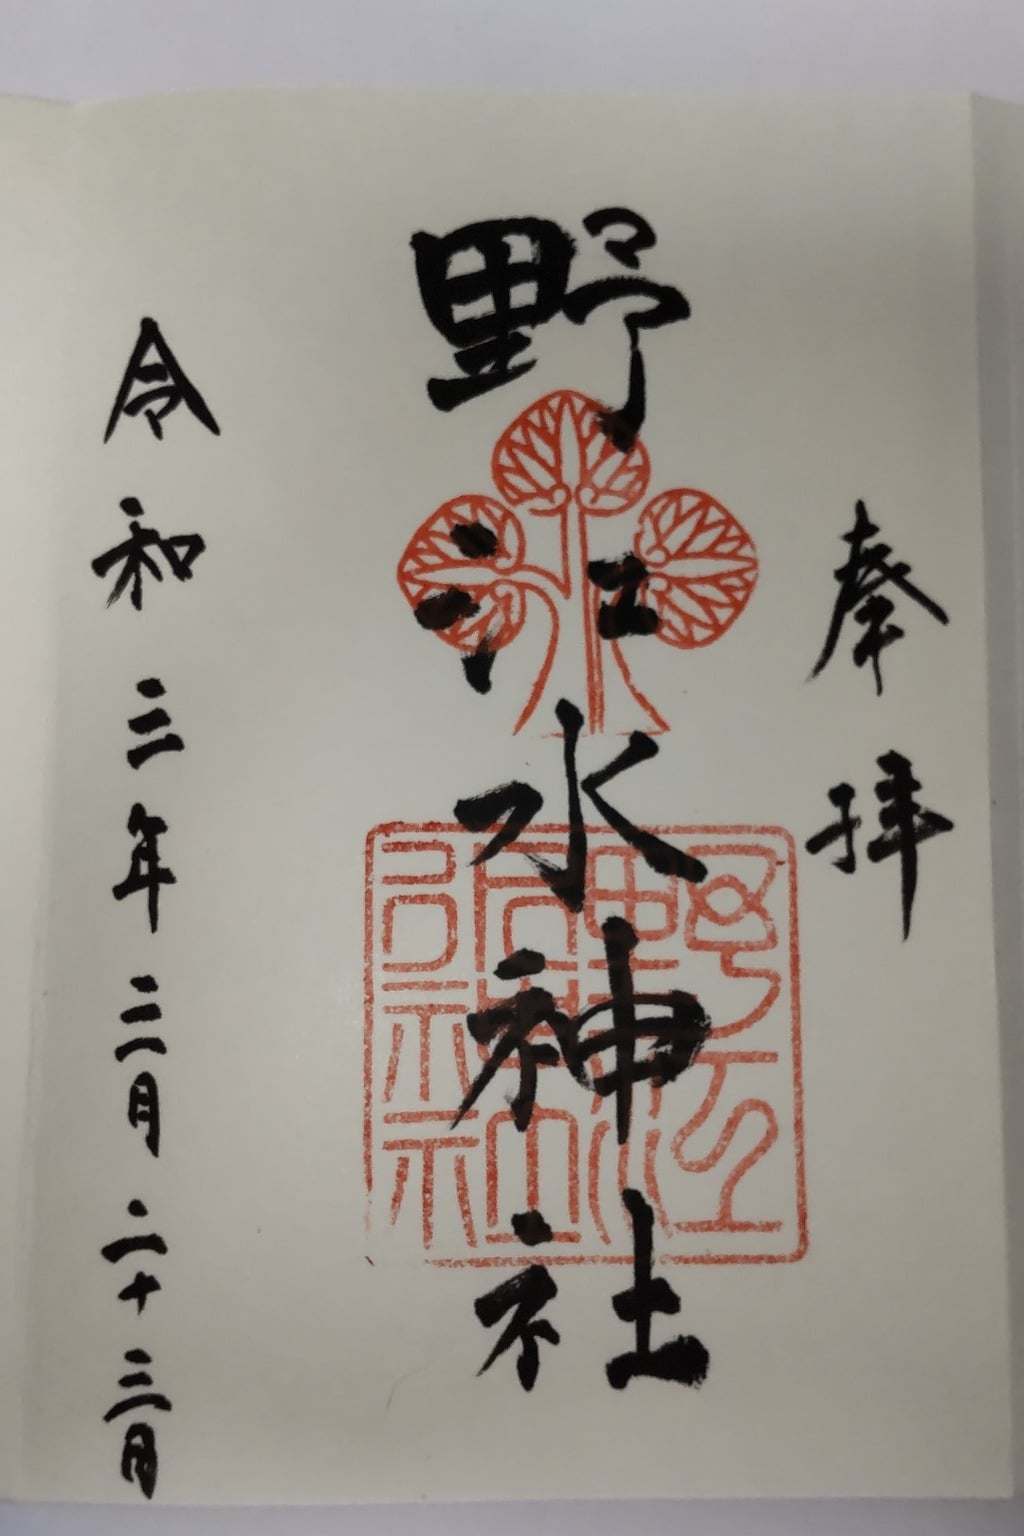 野江水神社の御朱印